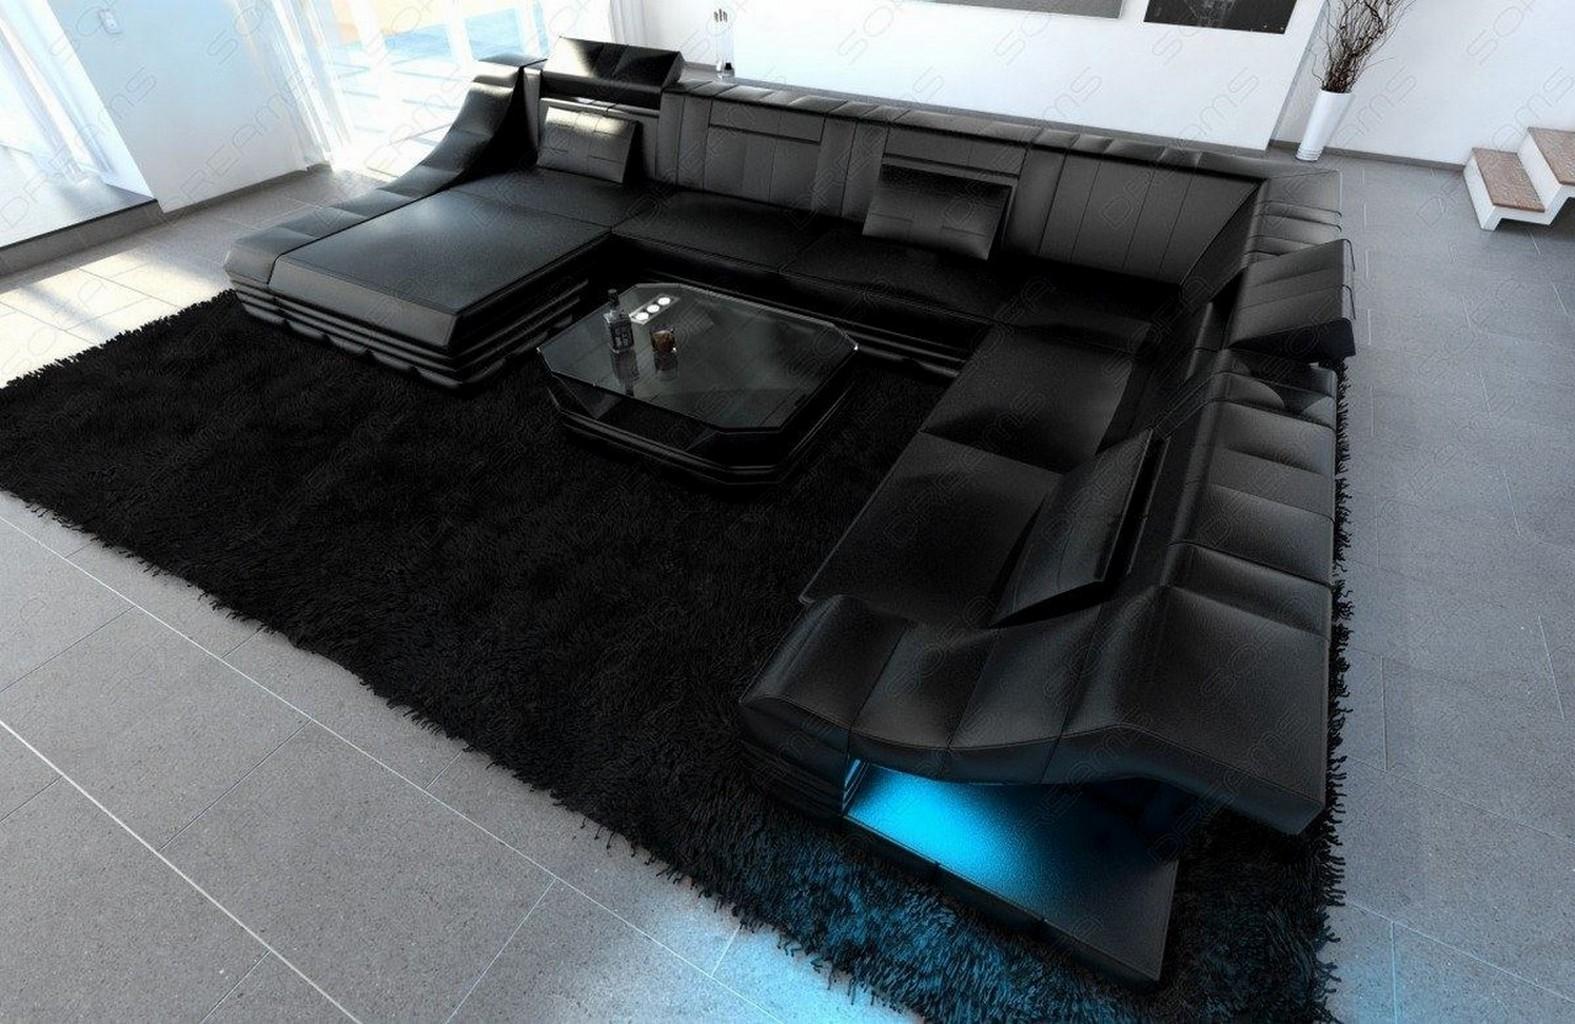 ledercouch wohnlandschaft turino xxl luxussofa recamiere led beleuchtung schwarz ebay. Black Bedroom Furniture Sets. Home Design Ideas